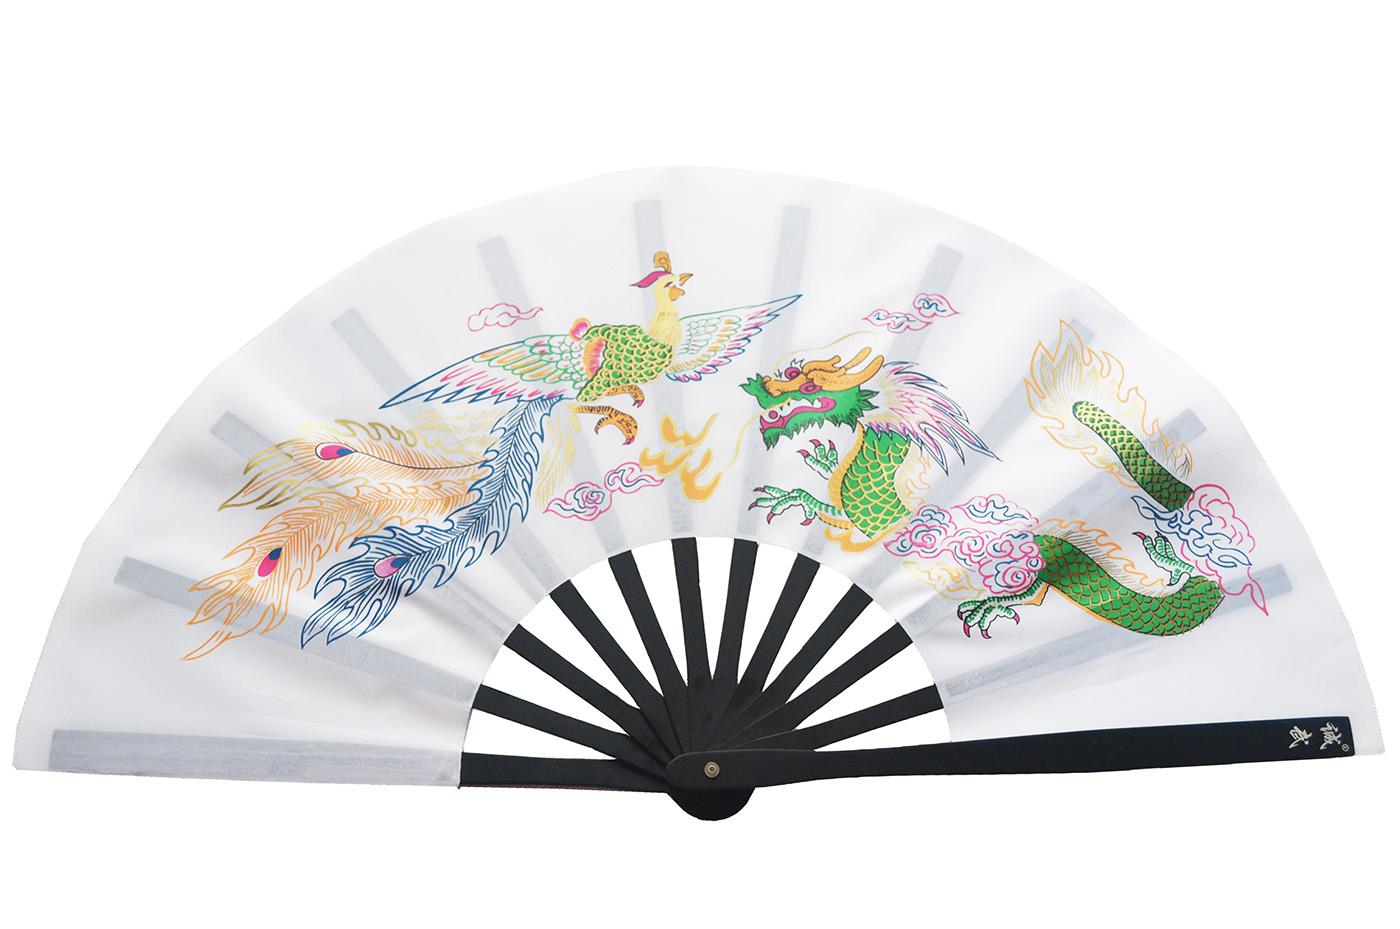 tai chi fan metallic upper range dragon and phoenix. Black Bedroom Furniture Sets. Home Design Ideas